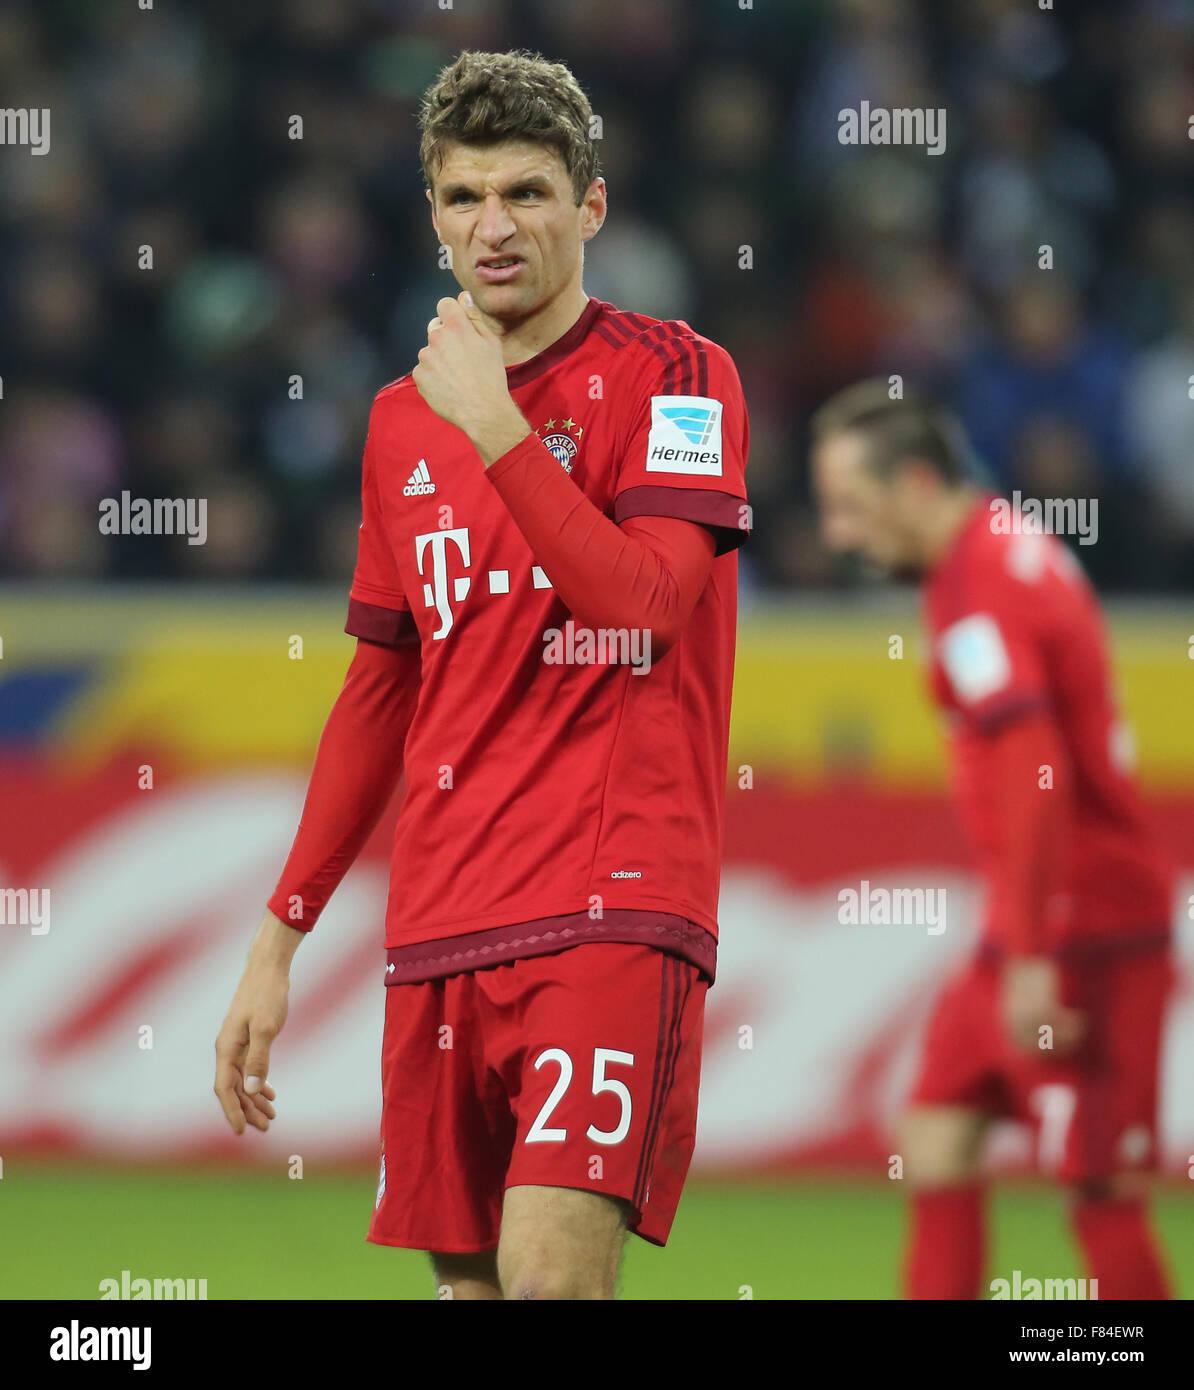 Germany, Bandesliga, Borussia Moenchengladbach vs Bayern Muenchen, Moenchengladbach, 05.12.2015: Thomas Mueller - Stock Image